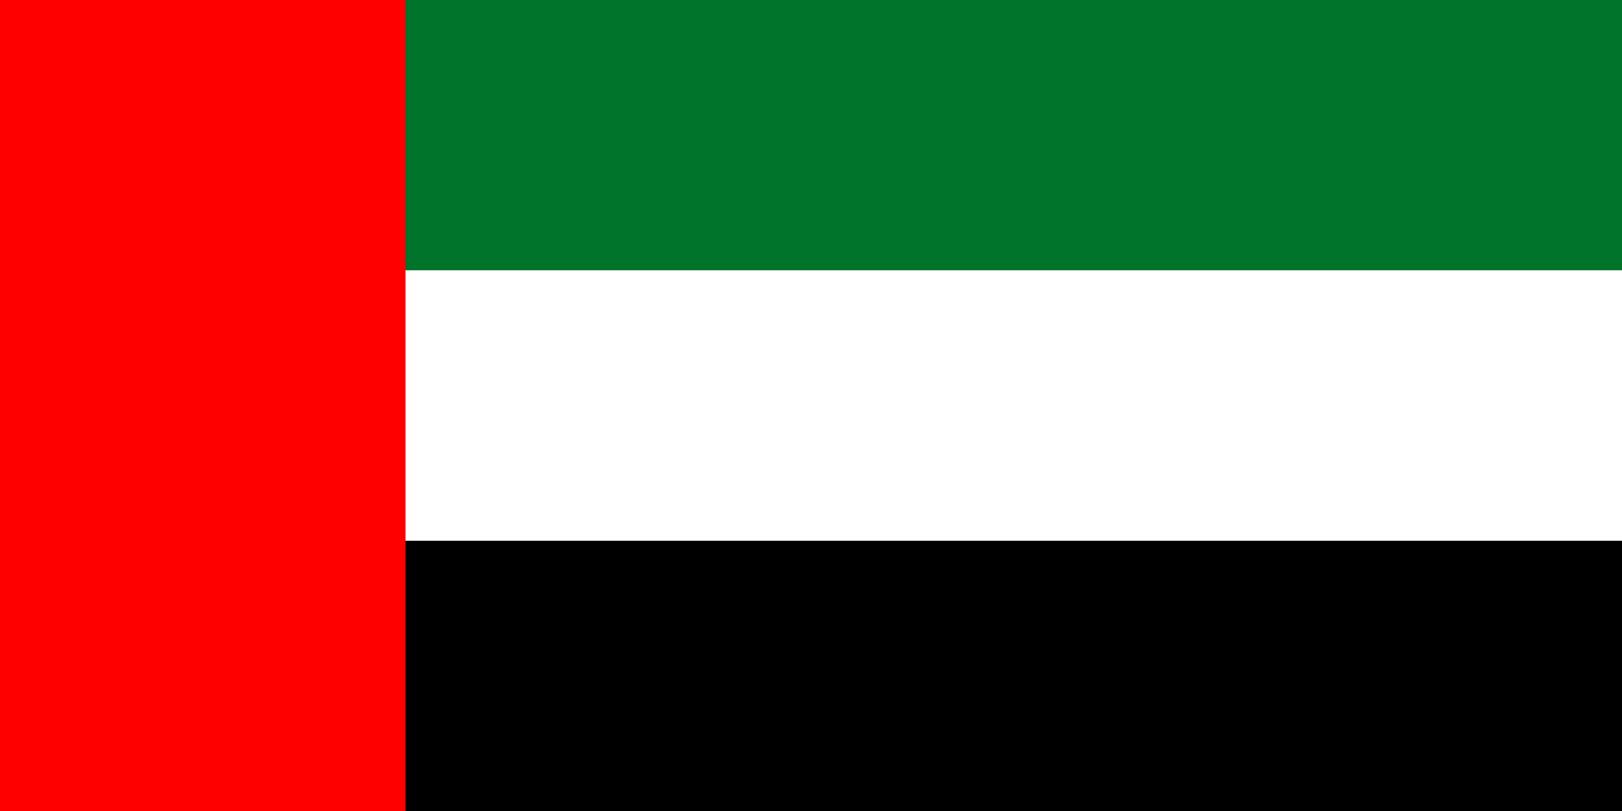 Flagge im Querformat Land VAE 150x100 cm